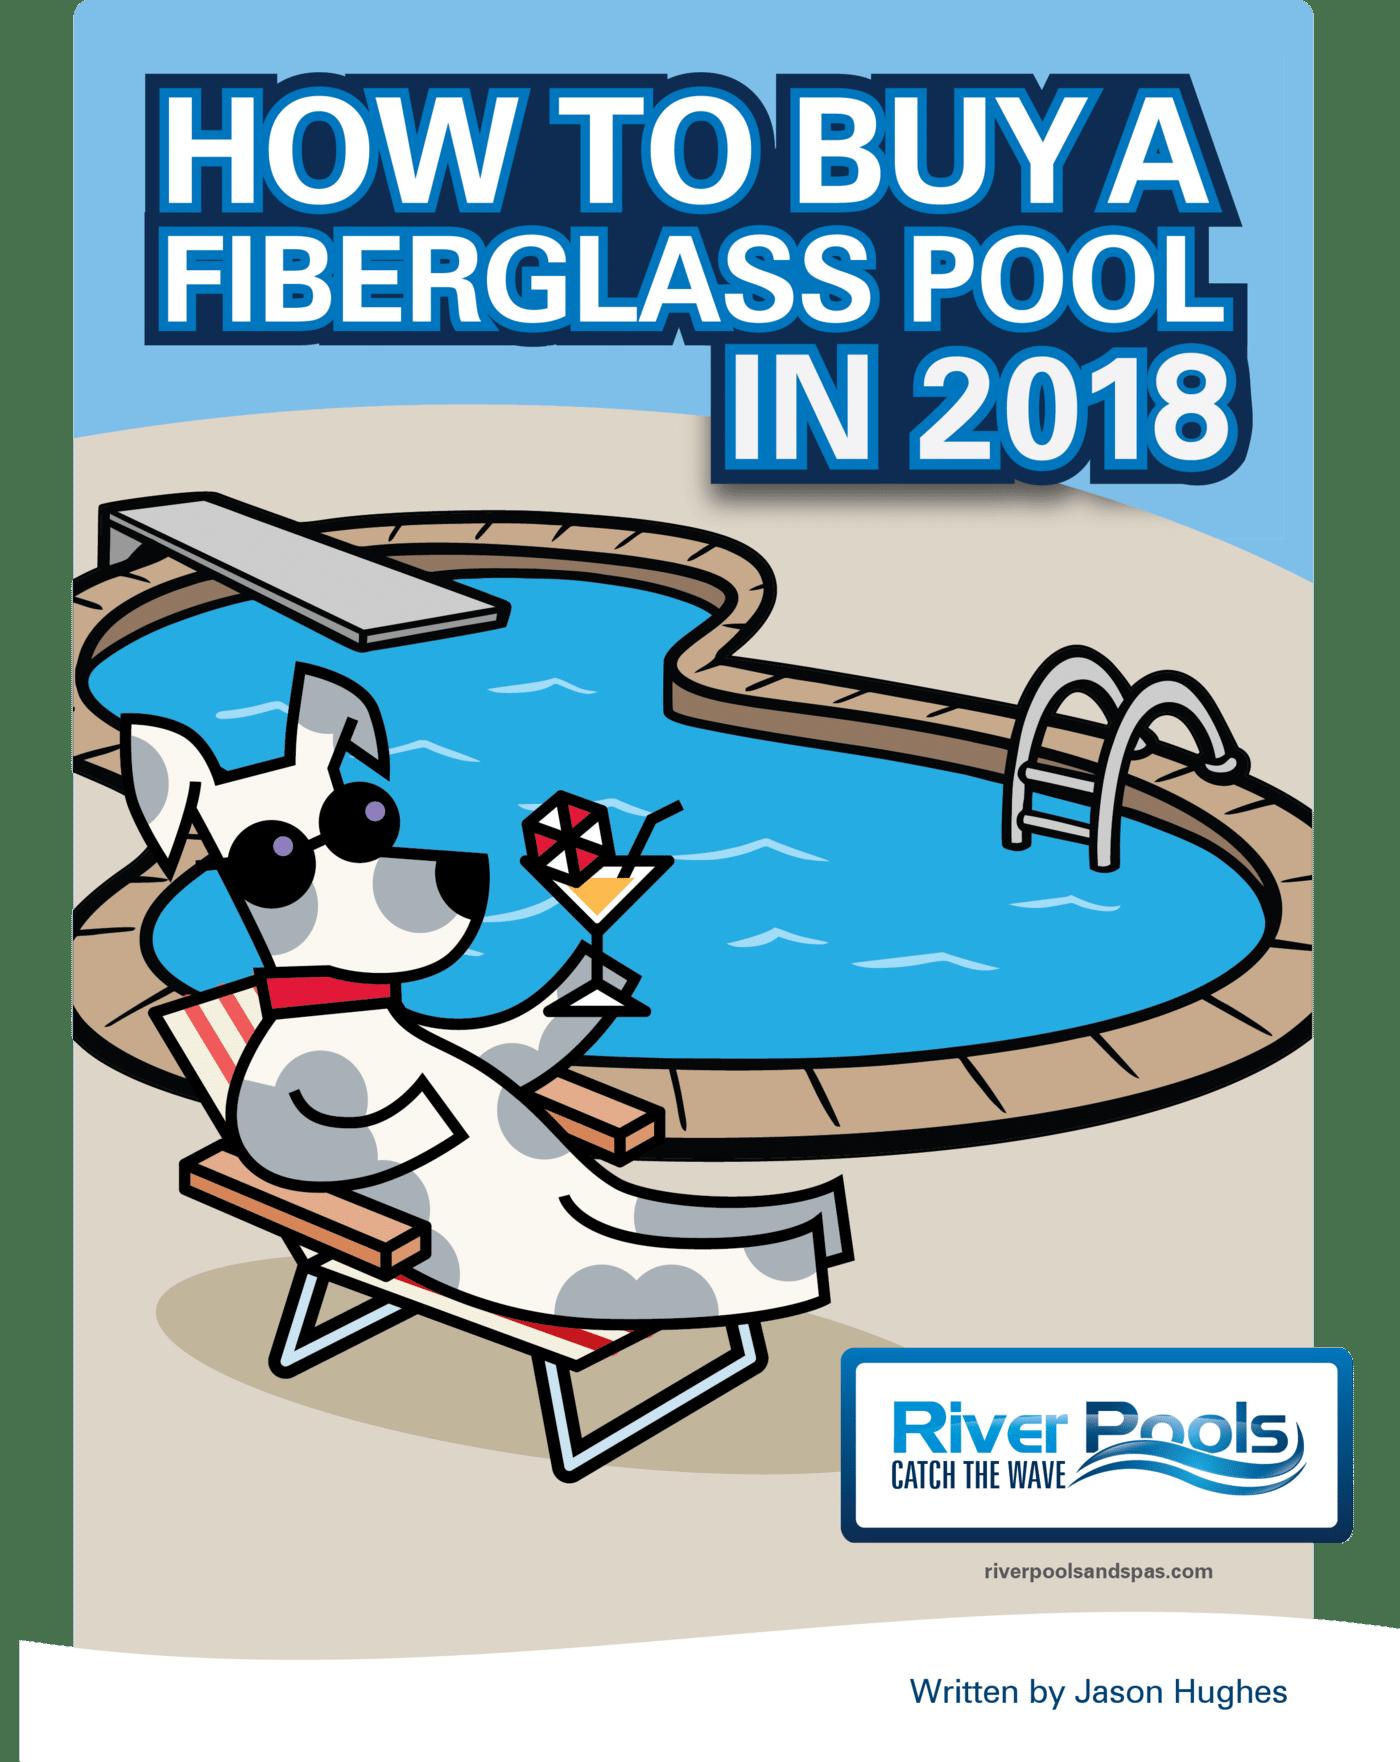 Ebook: How to Buy a Fiberglass Pool in 2018